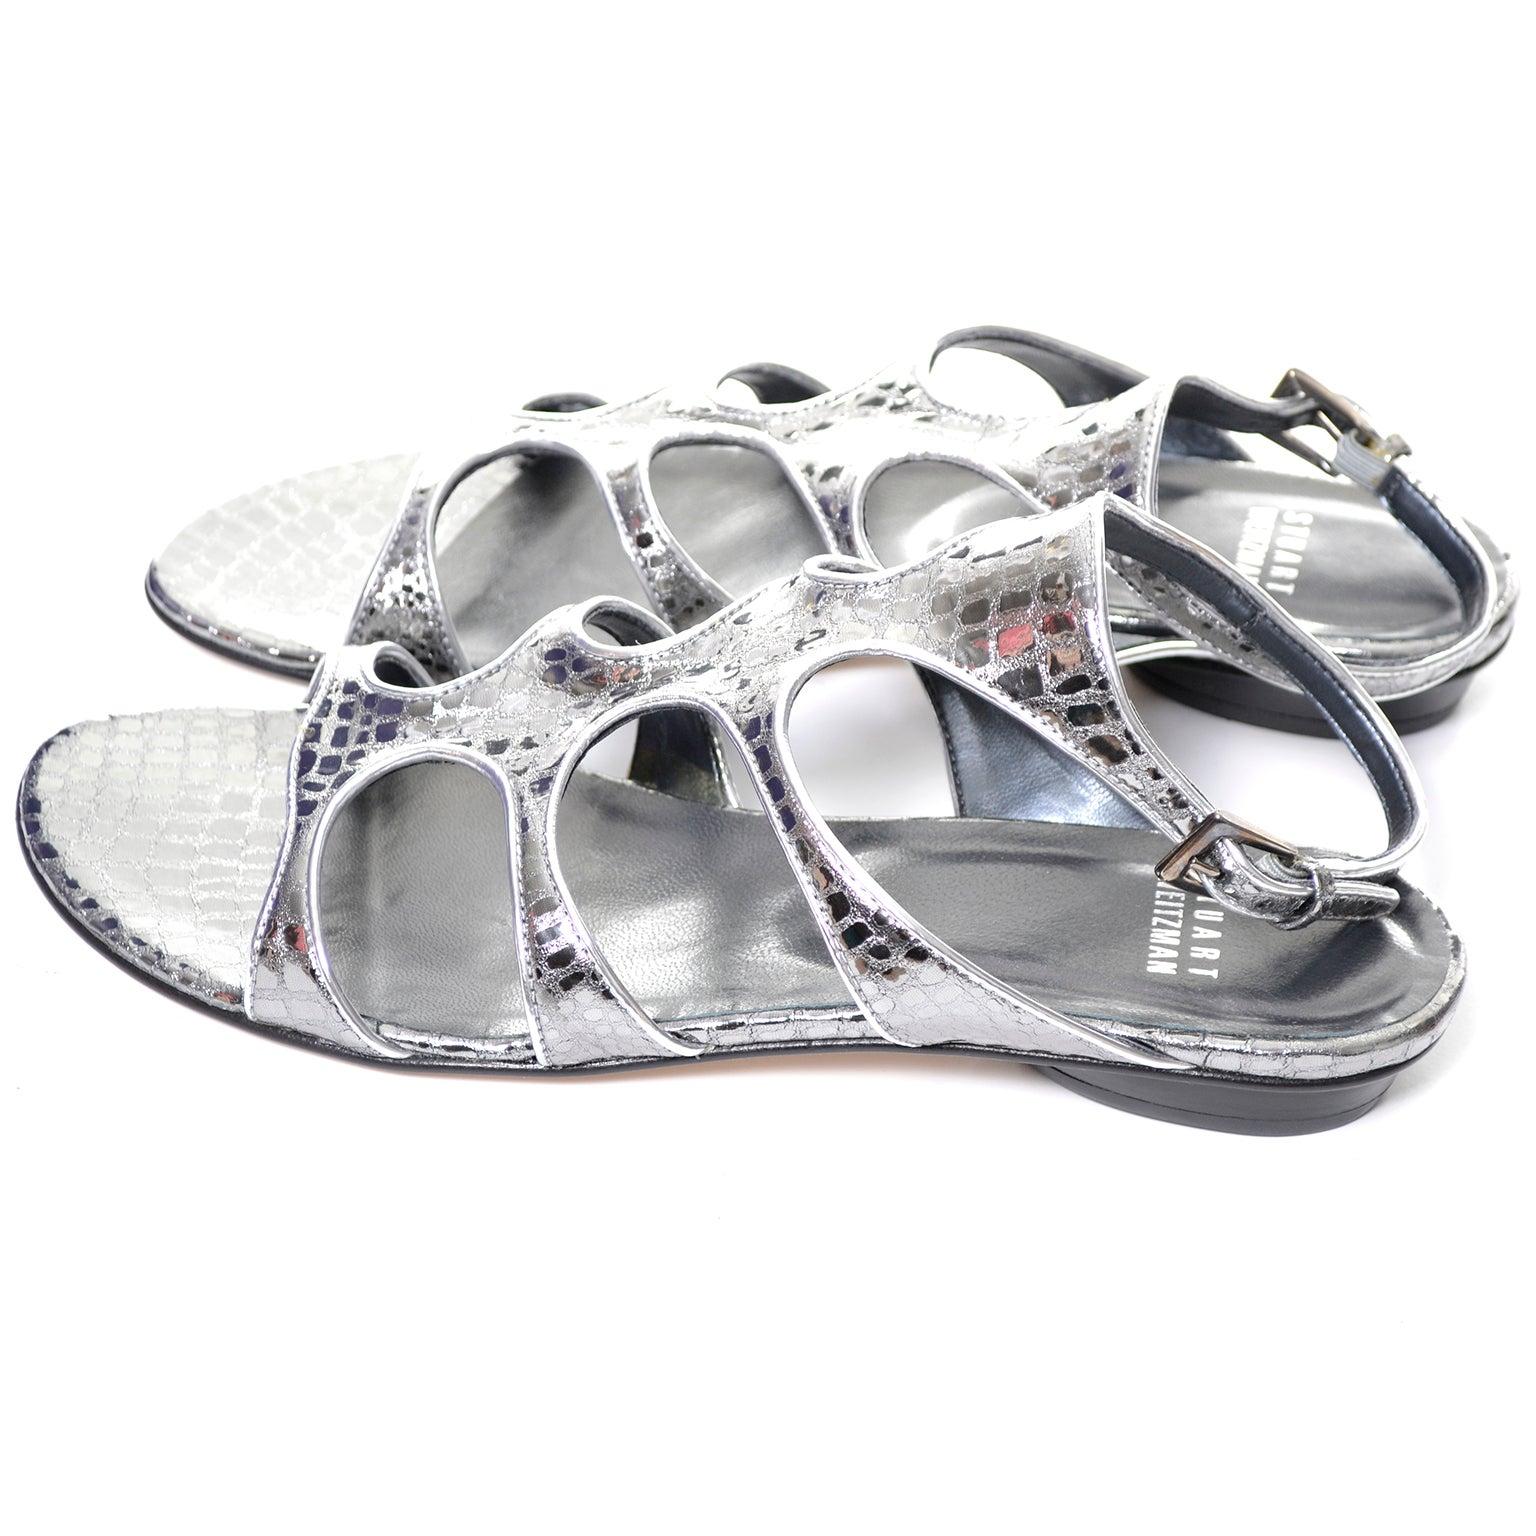 authentic Stuart Weitzman Gladio Metallic Sandals cheap sale low shipping fee outlet 100% guaranteed nrf9Btgufc